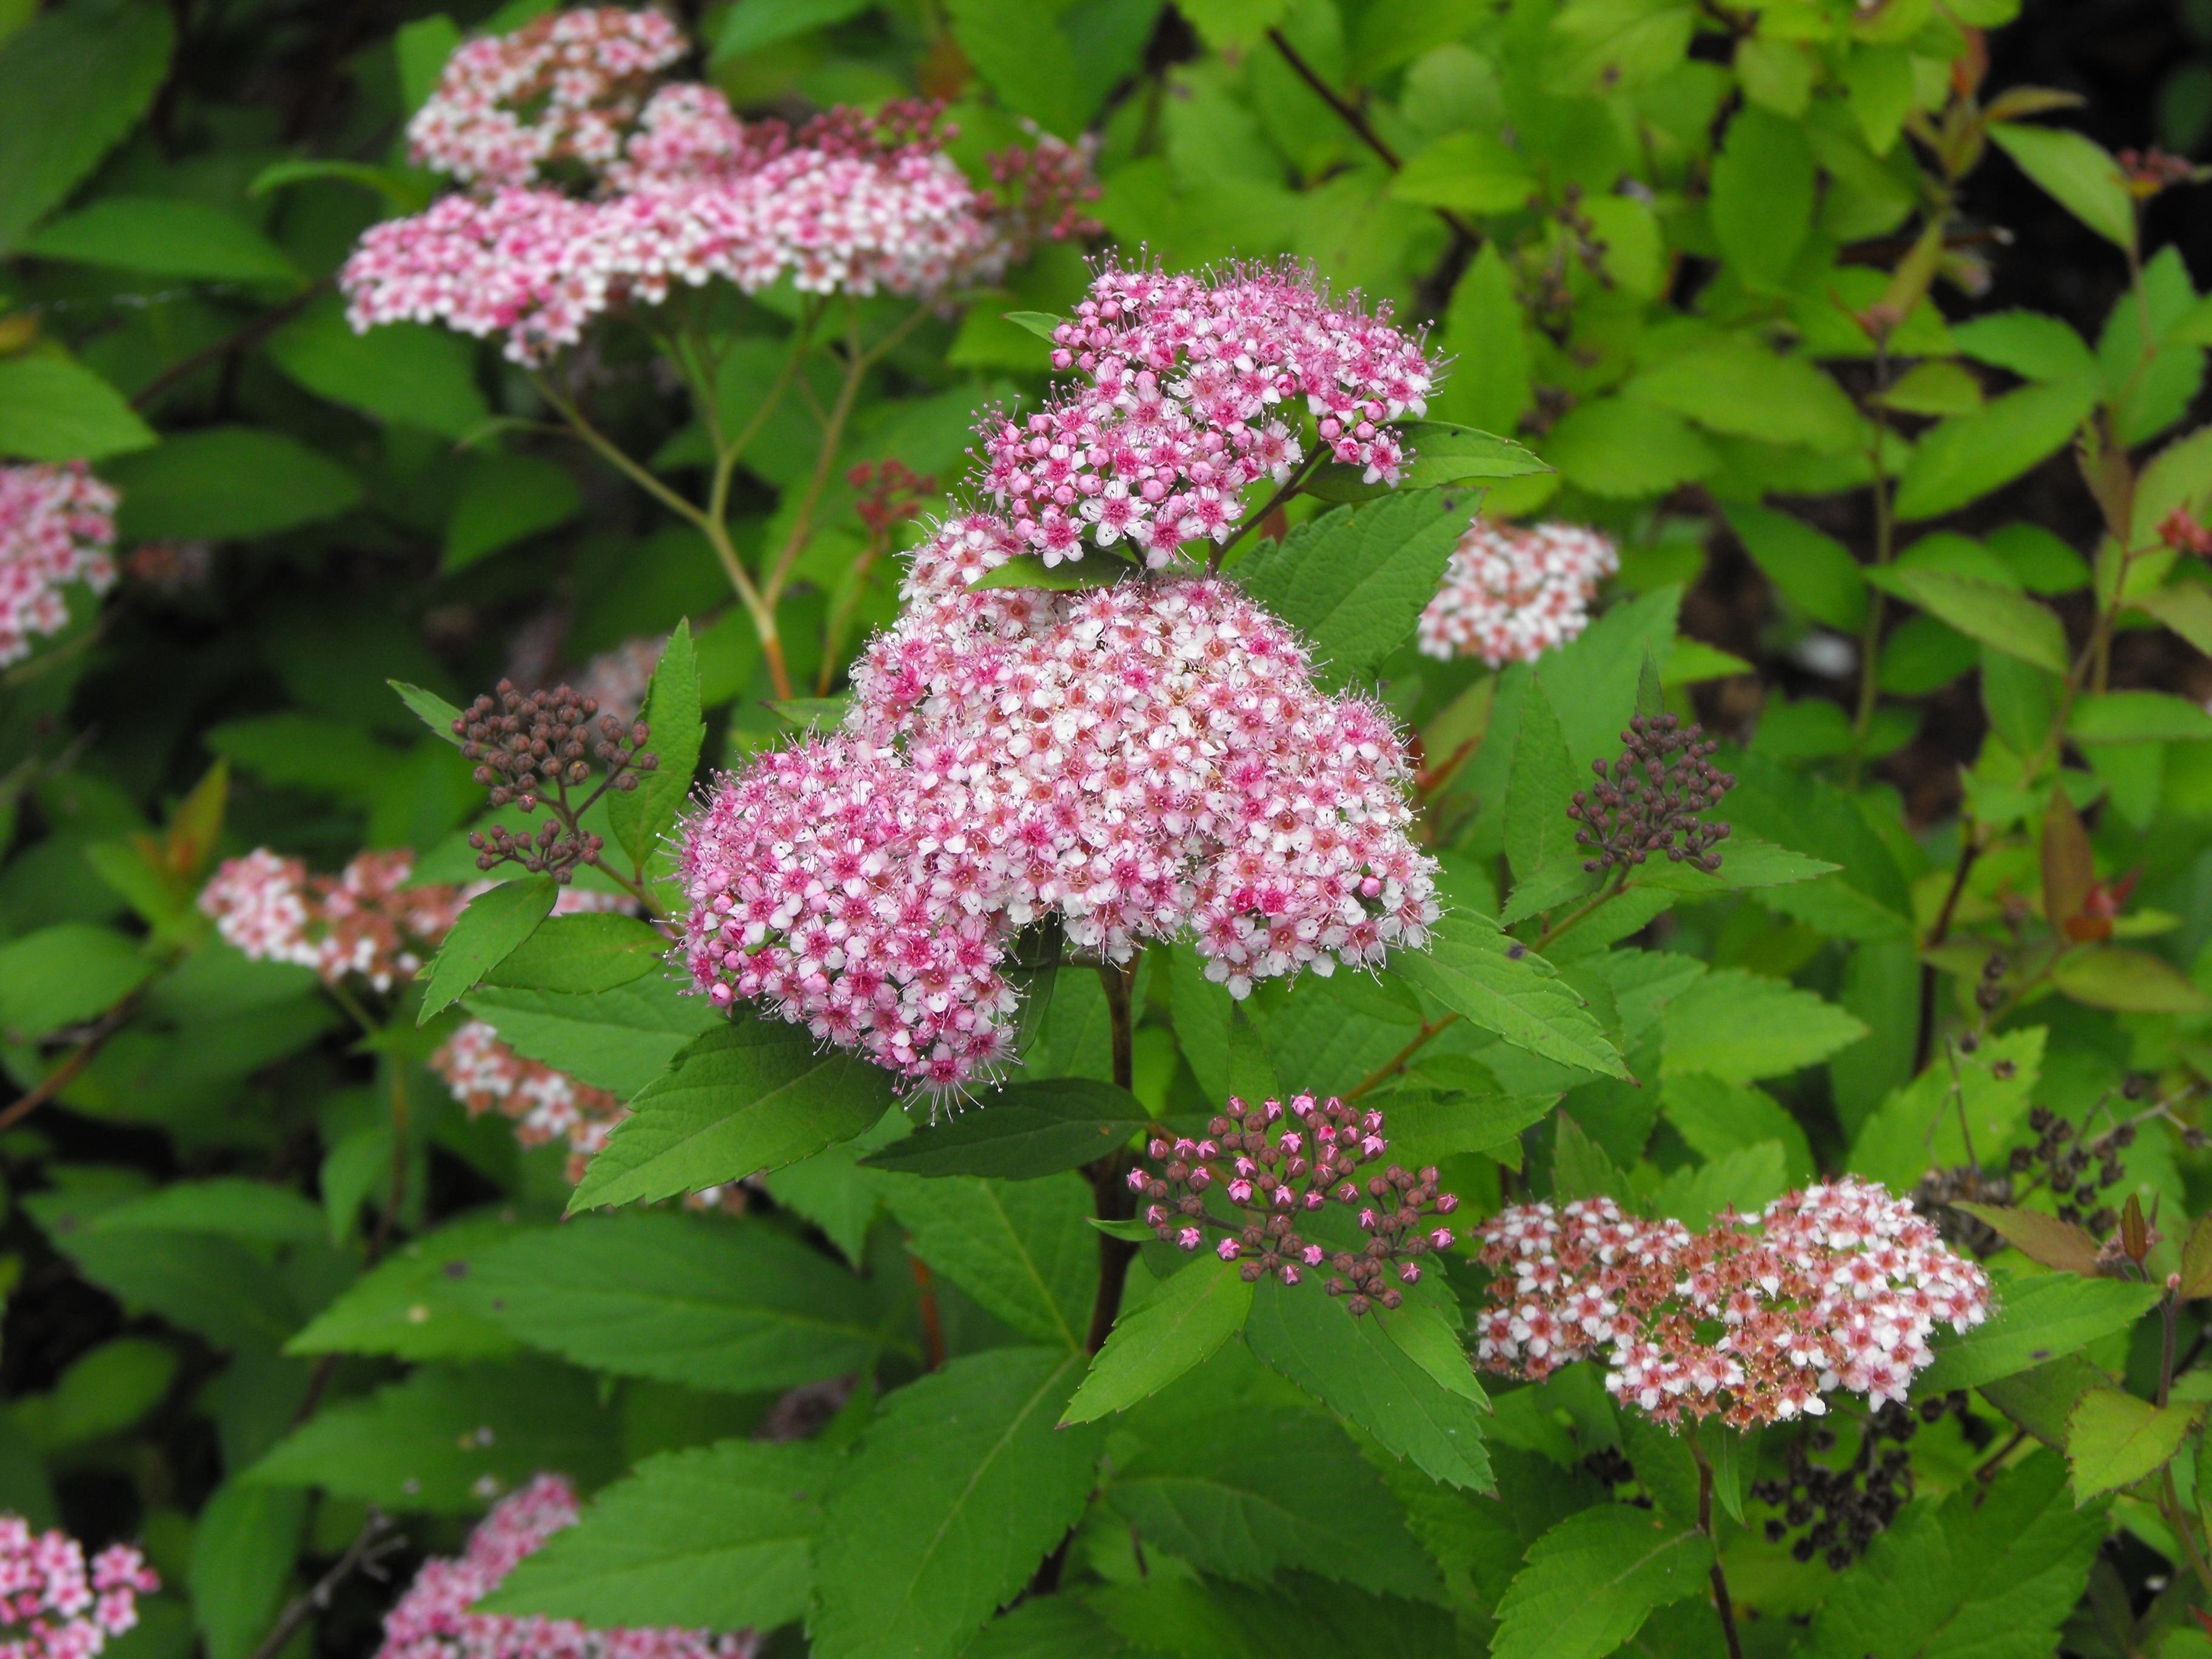 Pianta Fiori Rosa.Immagini Belle Estate Botanica Ortensia Fiori Arbusto